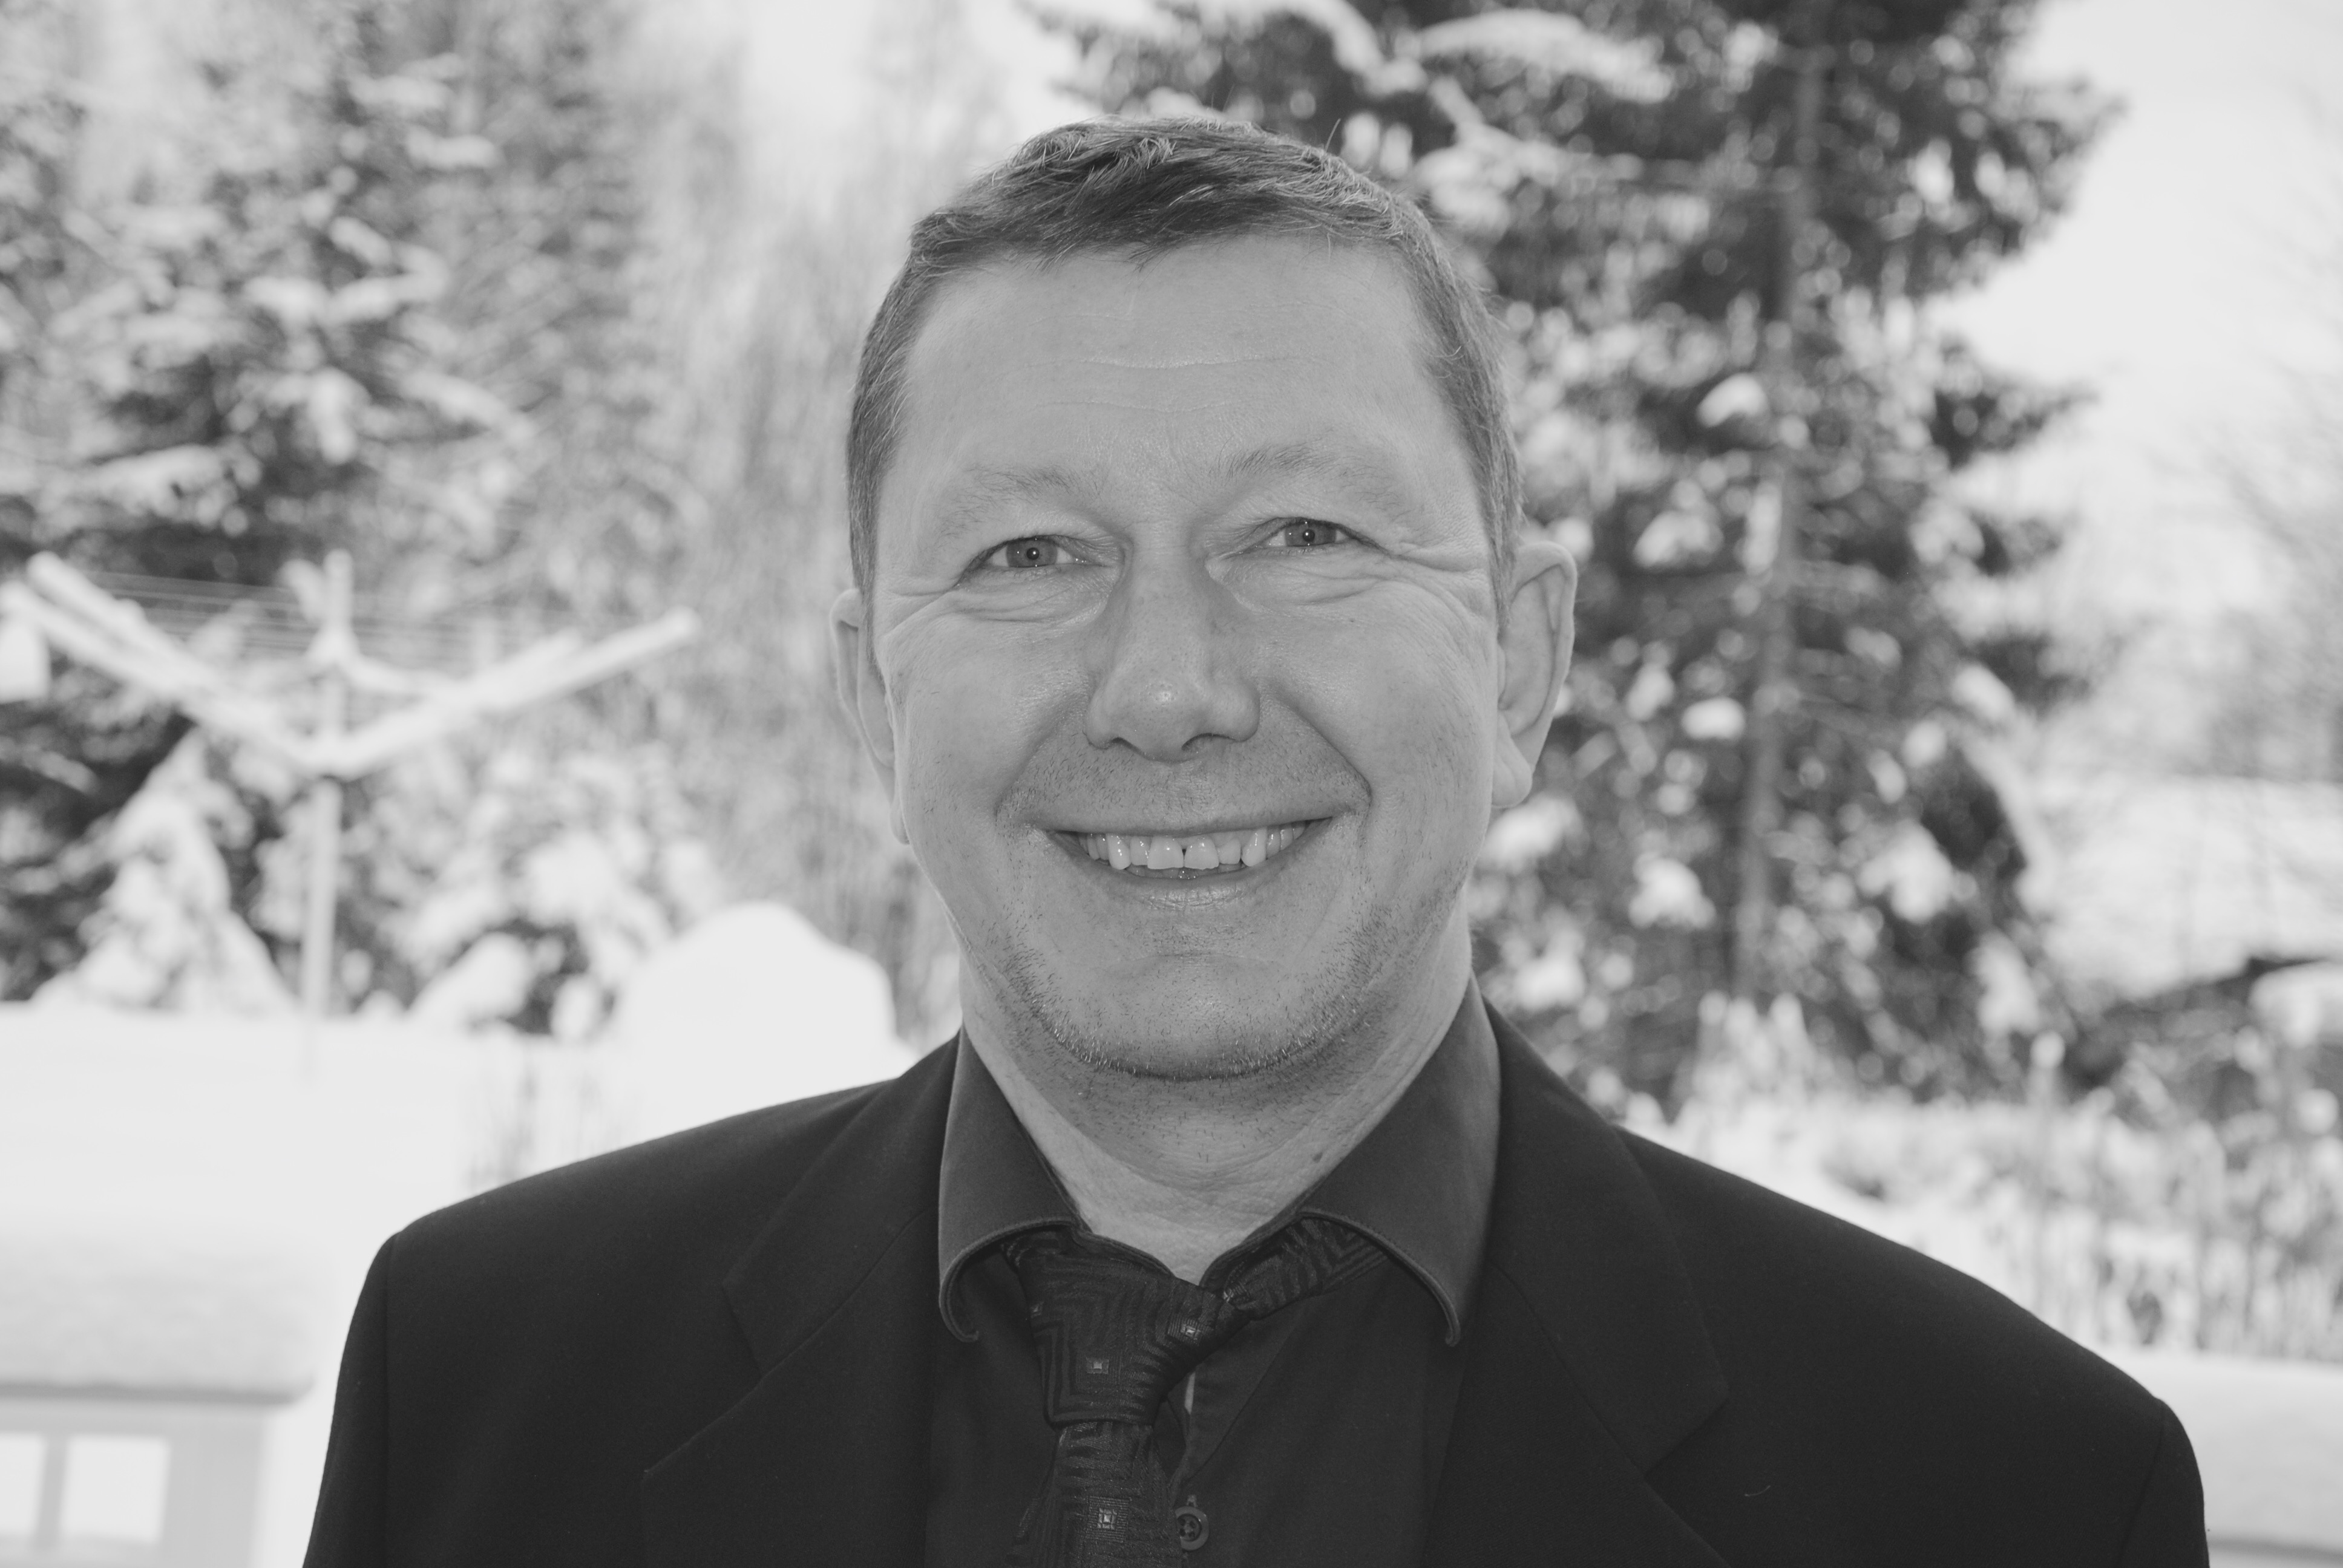 VC_torbjorn_bergstrom_sundsvall